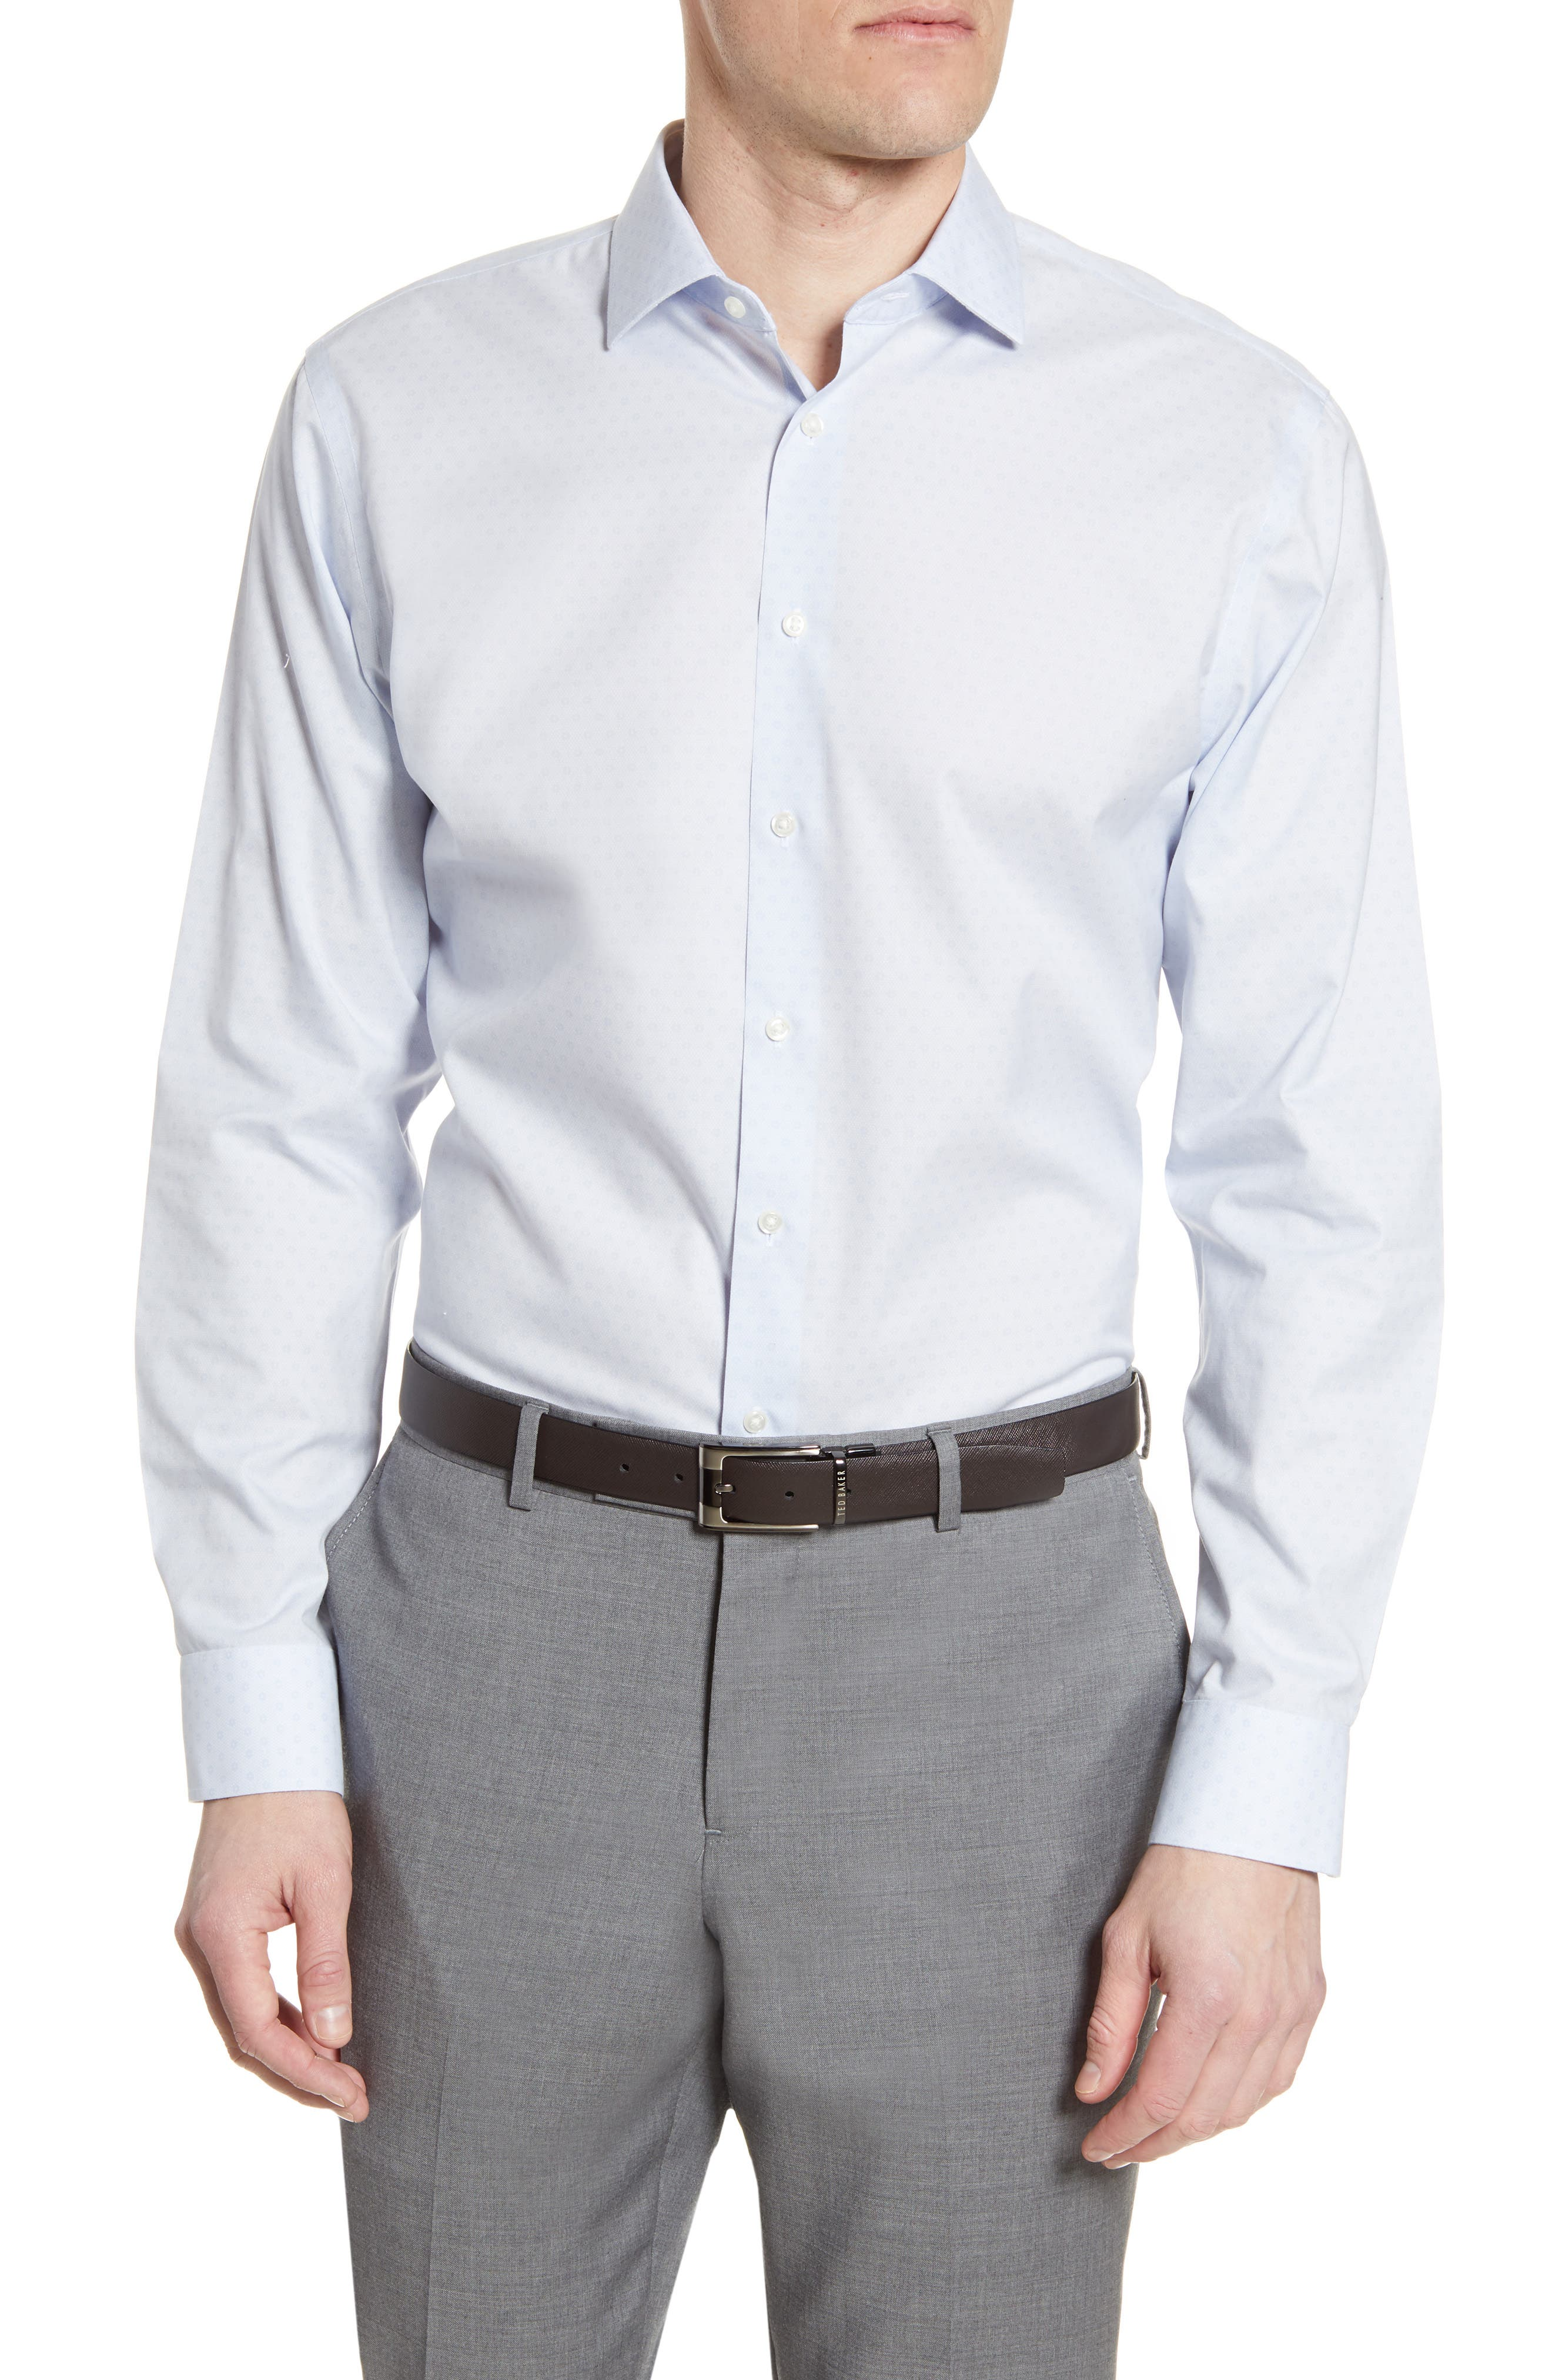 NORDSTROM MEN'S SHOP Trim Fit Non-Iron Neat Stretch Dress Shirt